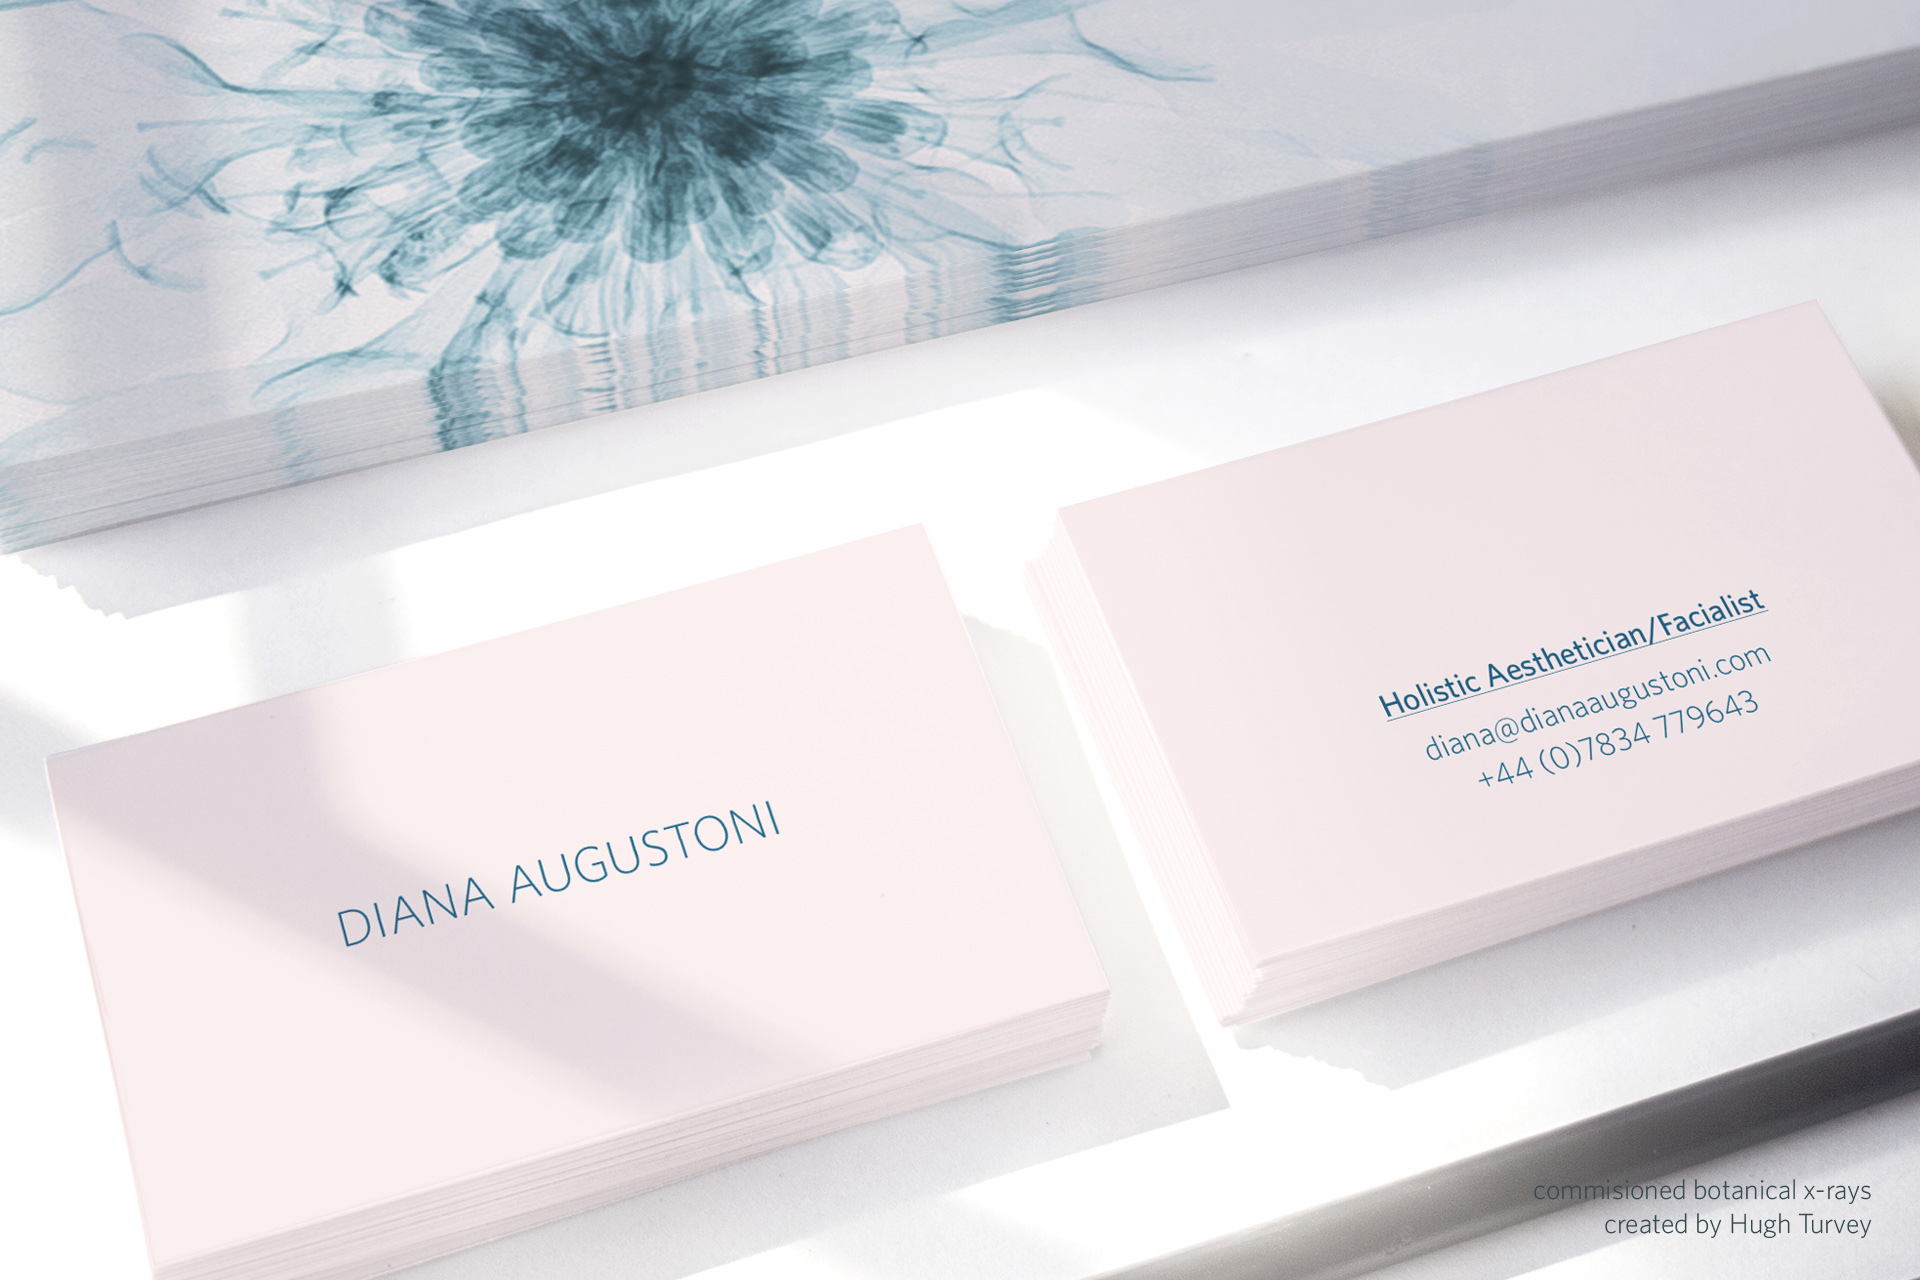 leesimmons-home-diana-augustoni-branding-visual-identity-design.jpg